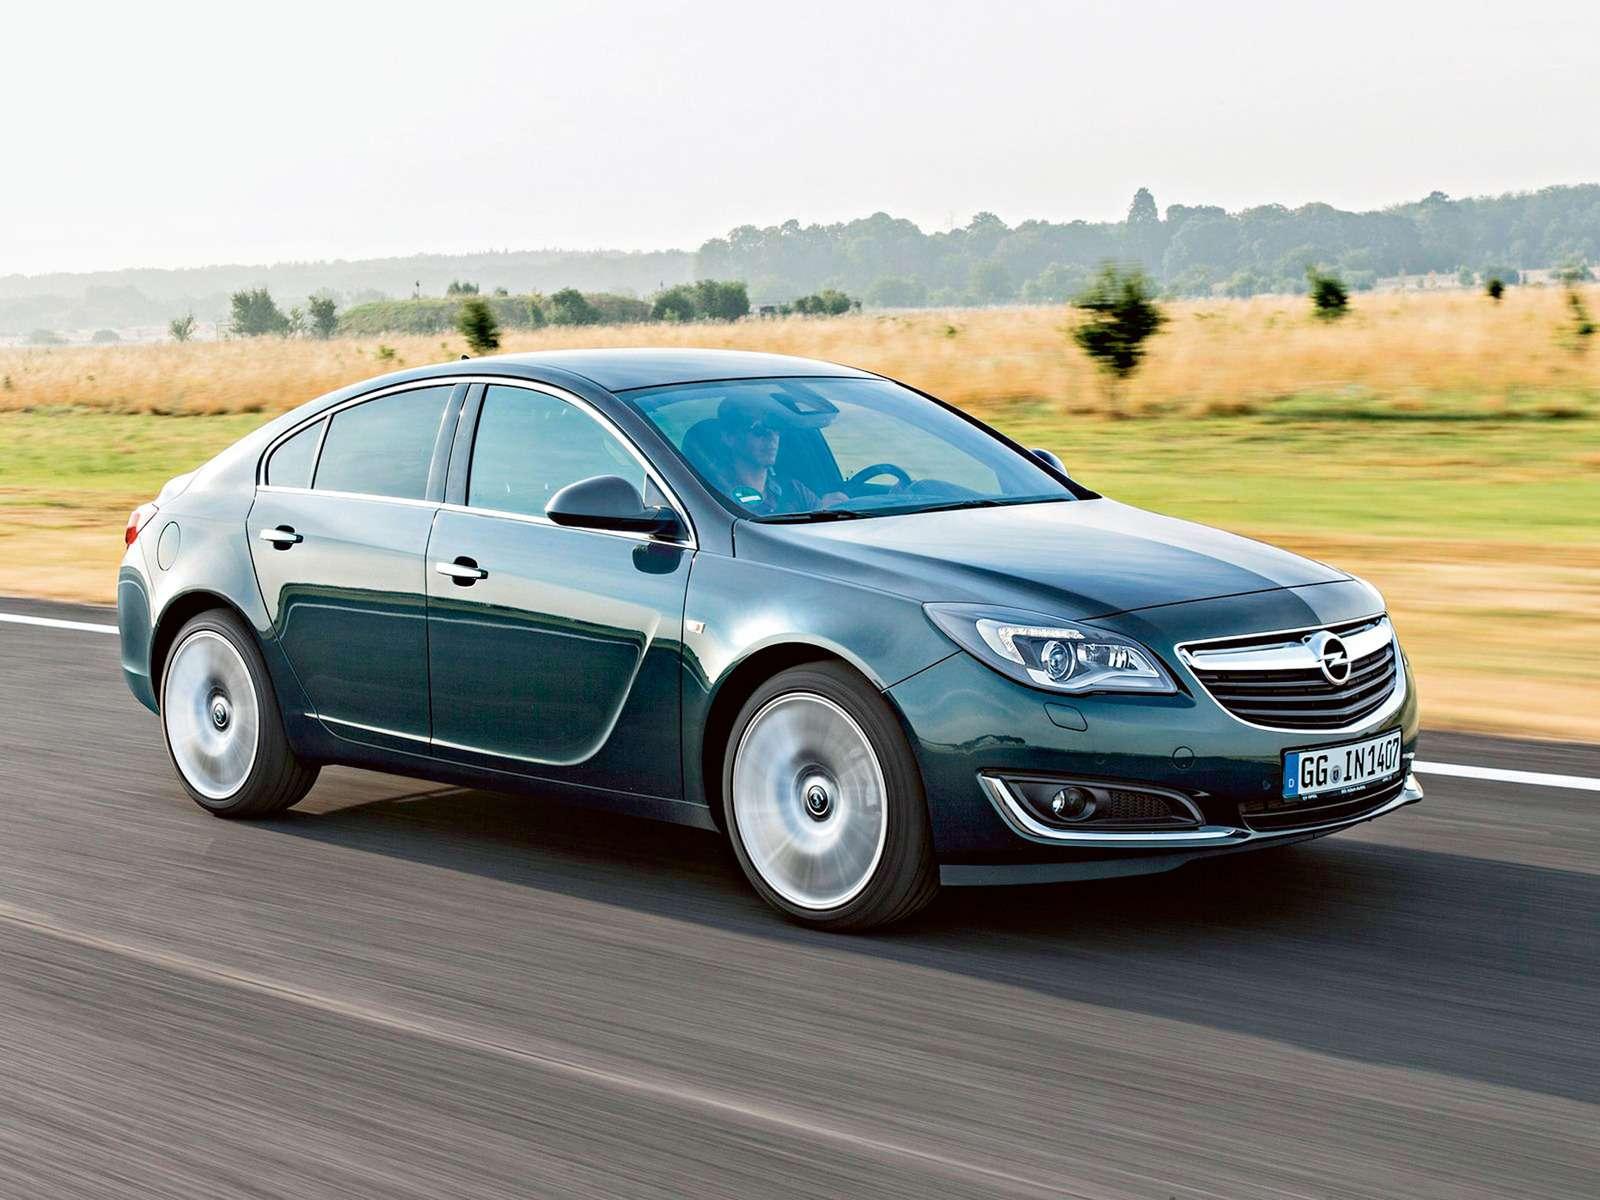 Opel-Insignia_2014_07